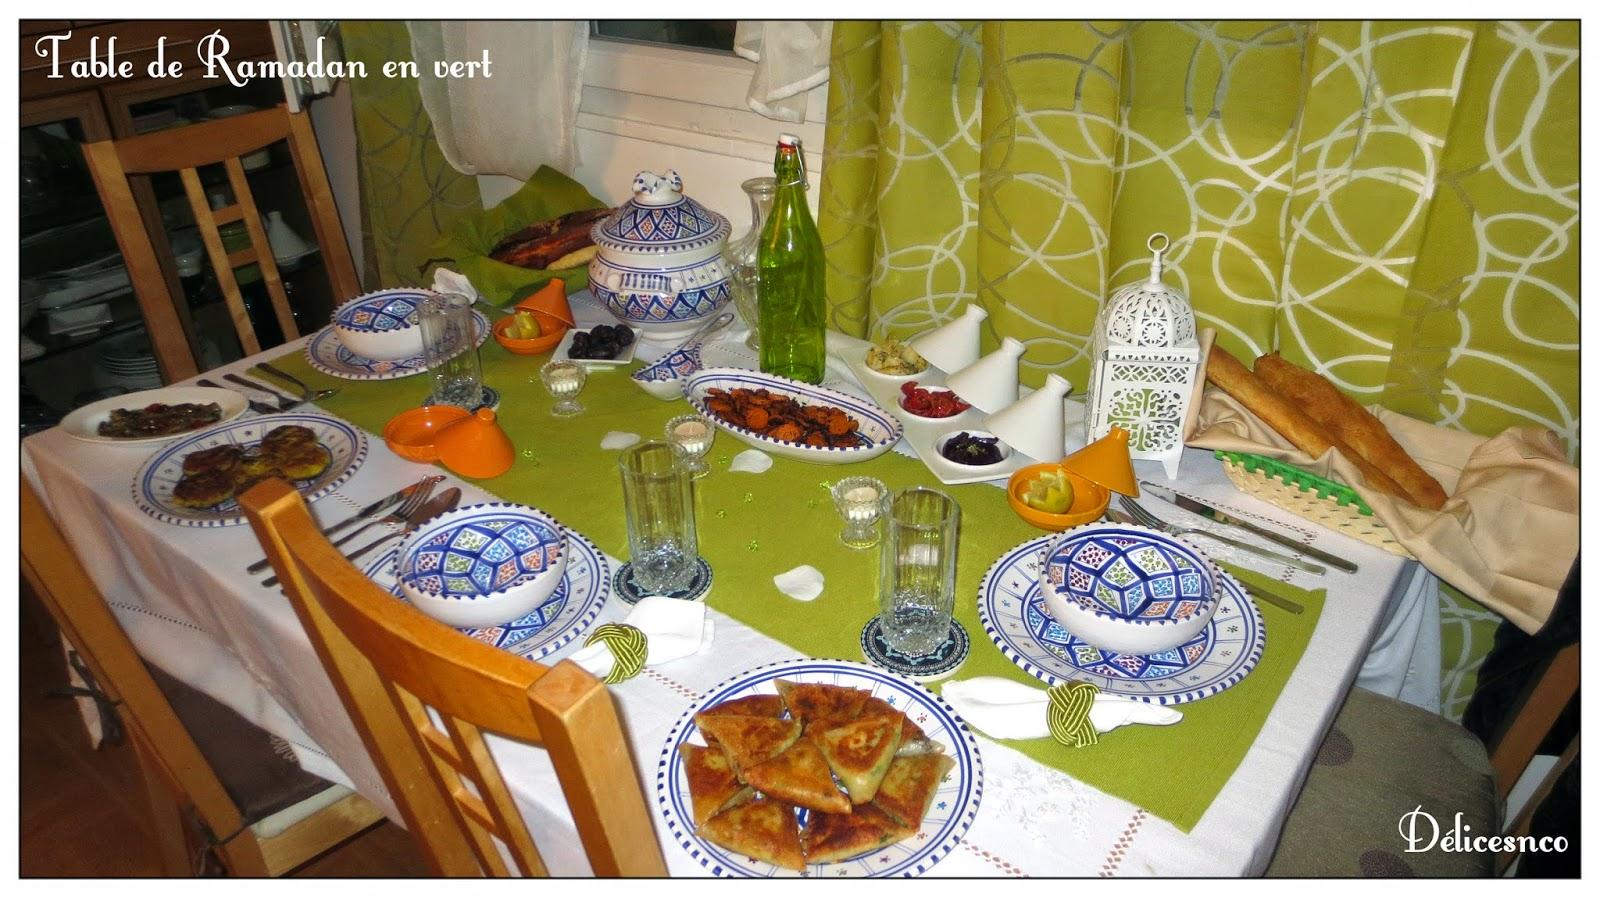 TABLE DE RAMADAN DECORATION EN VERT